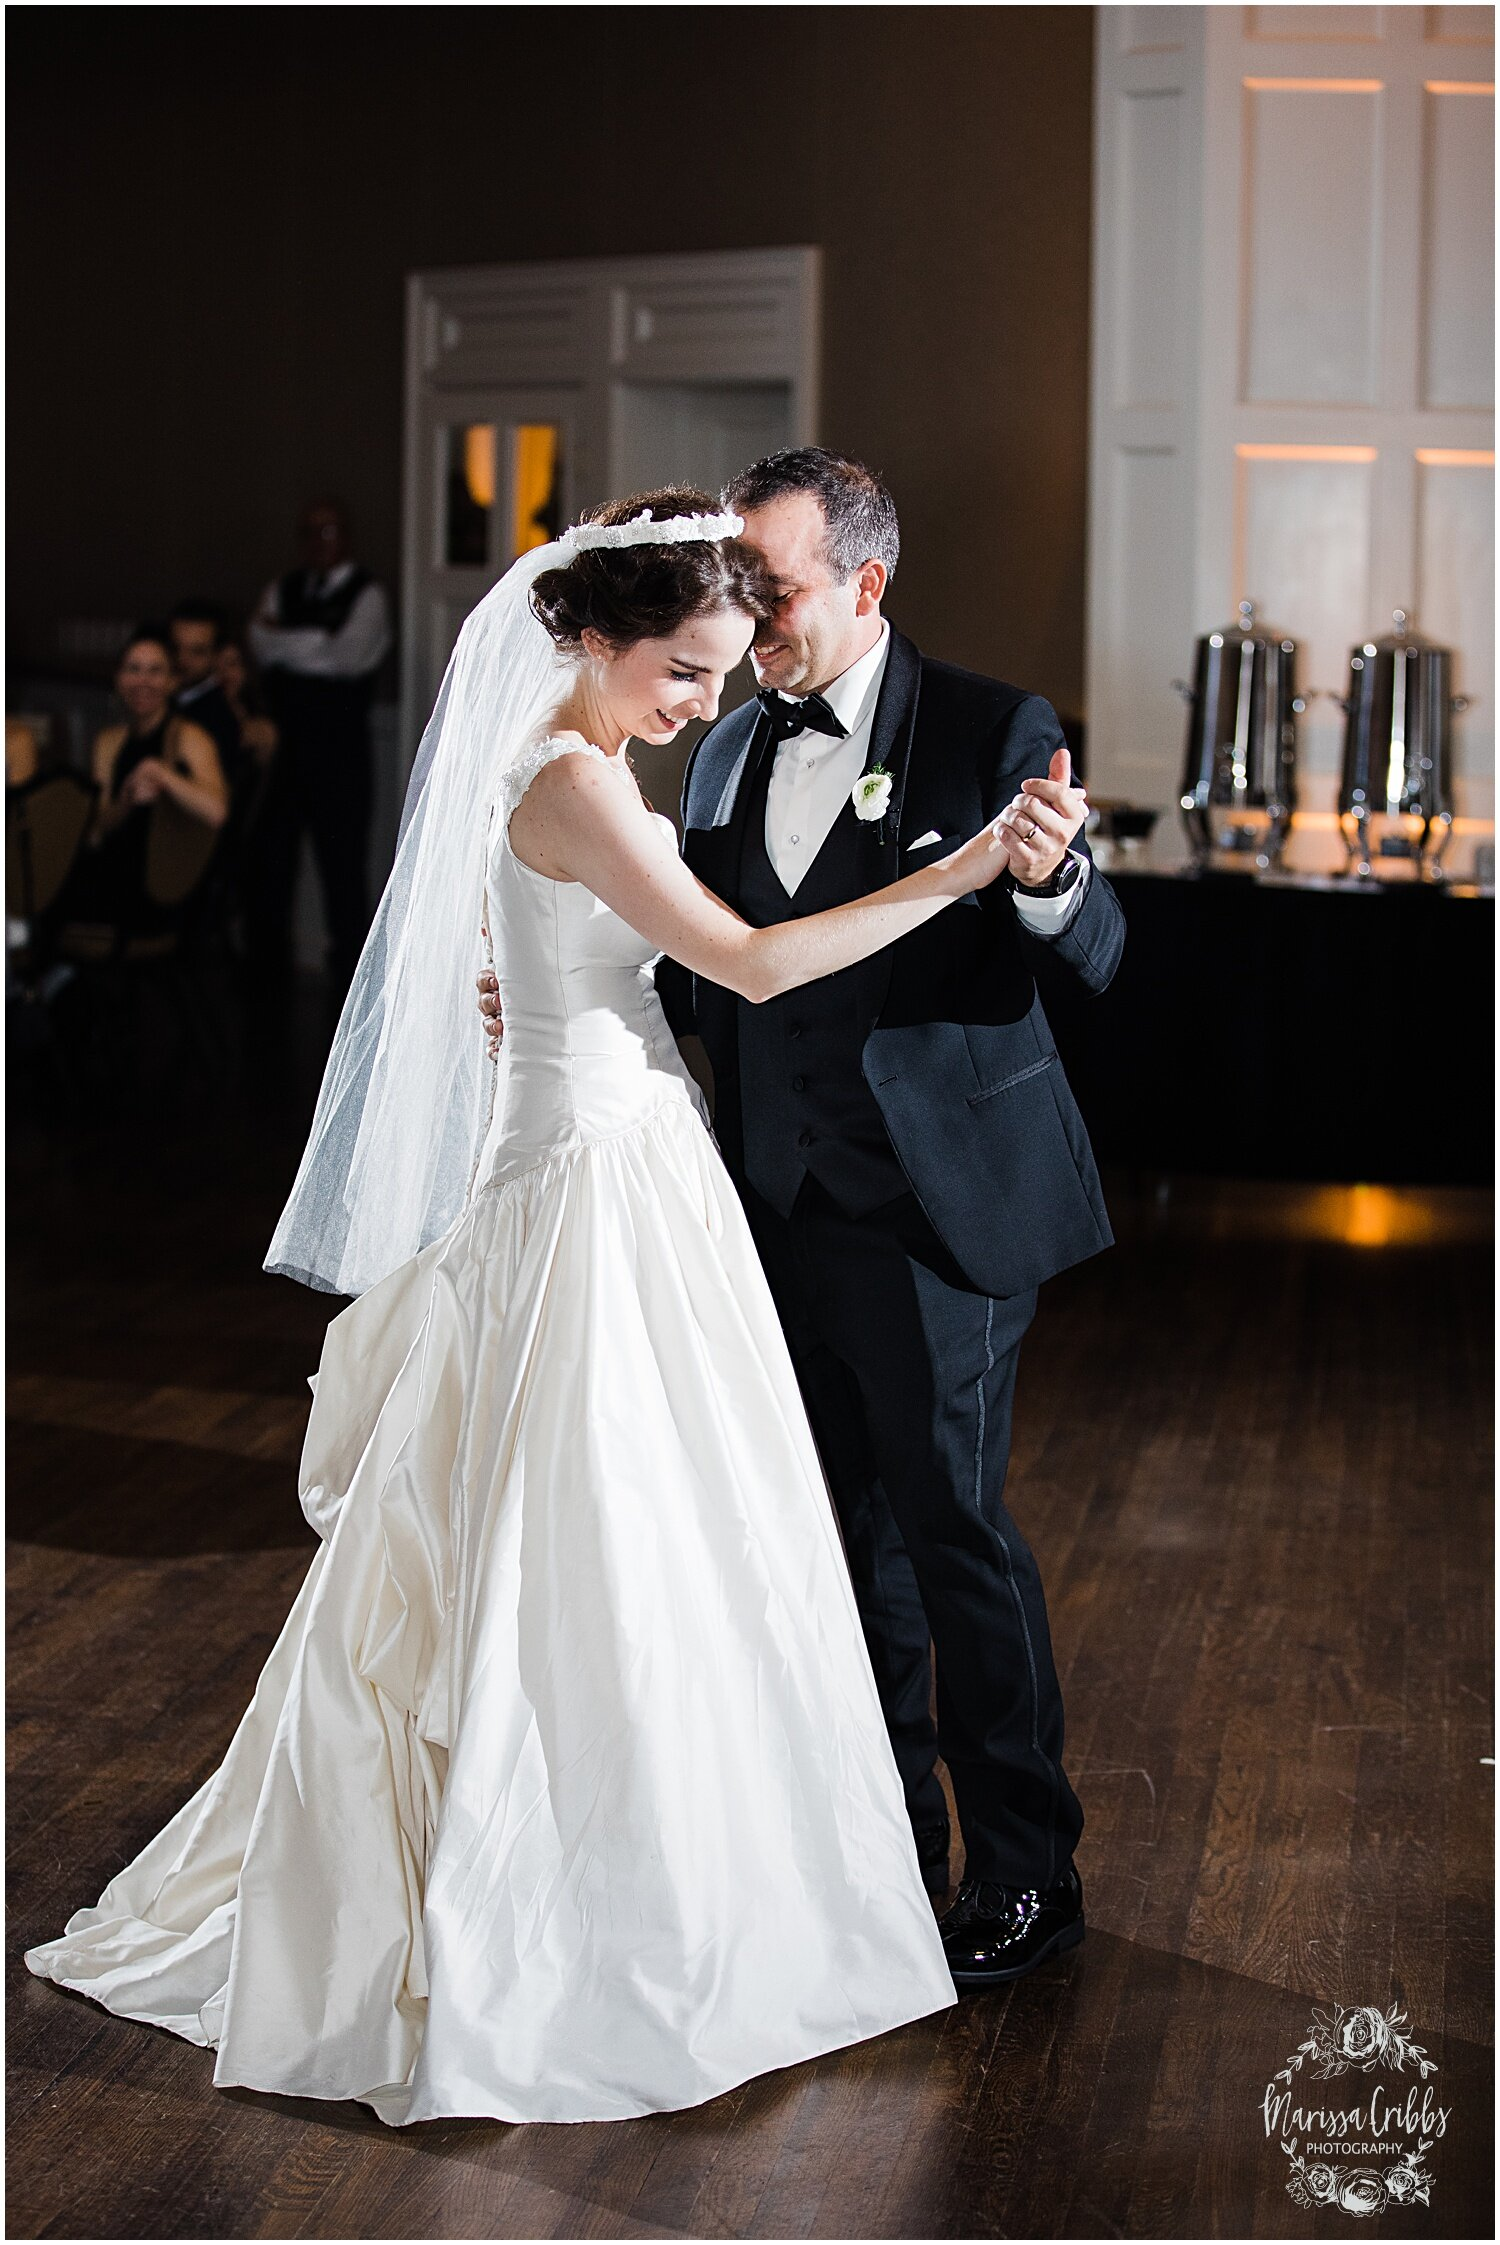 TYLER & CAROLINE MARRIED BLOG | MARISSA CRIBBS PHOTOGRAPHY | THE CARRIAGE CLUB | KANSAS CITY WEDDING PHOTOS_9283.jpg